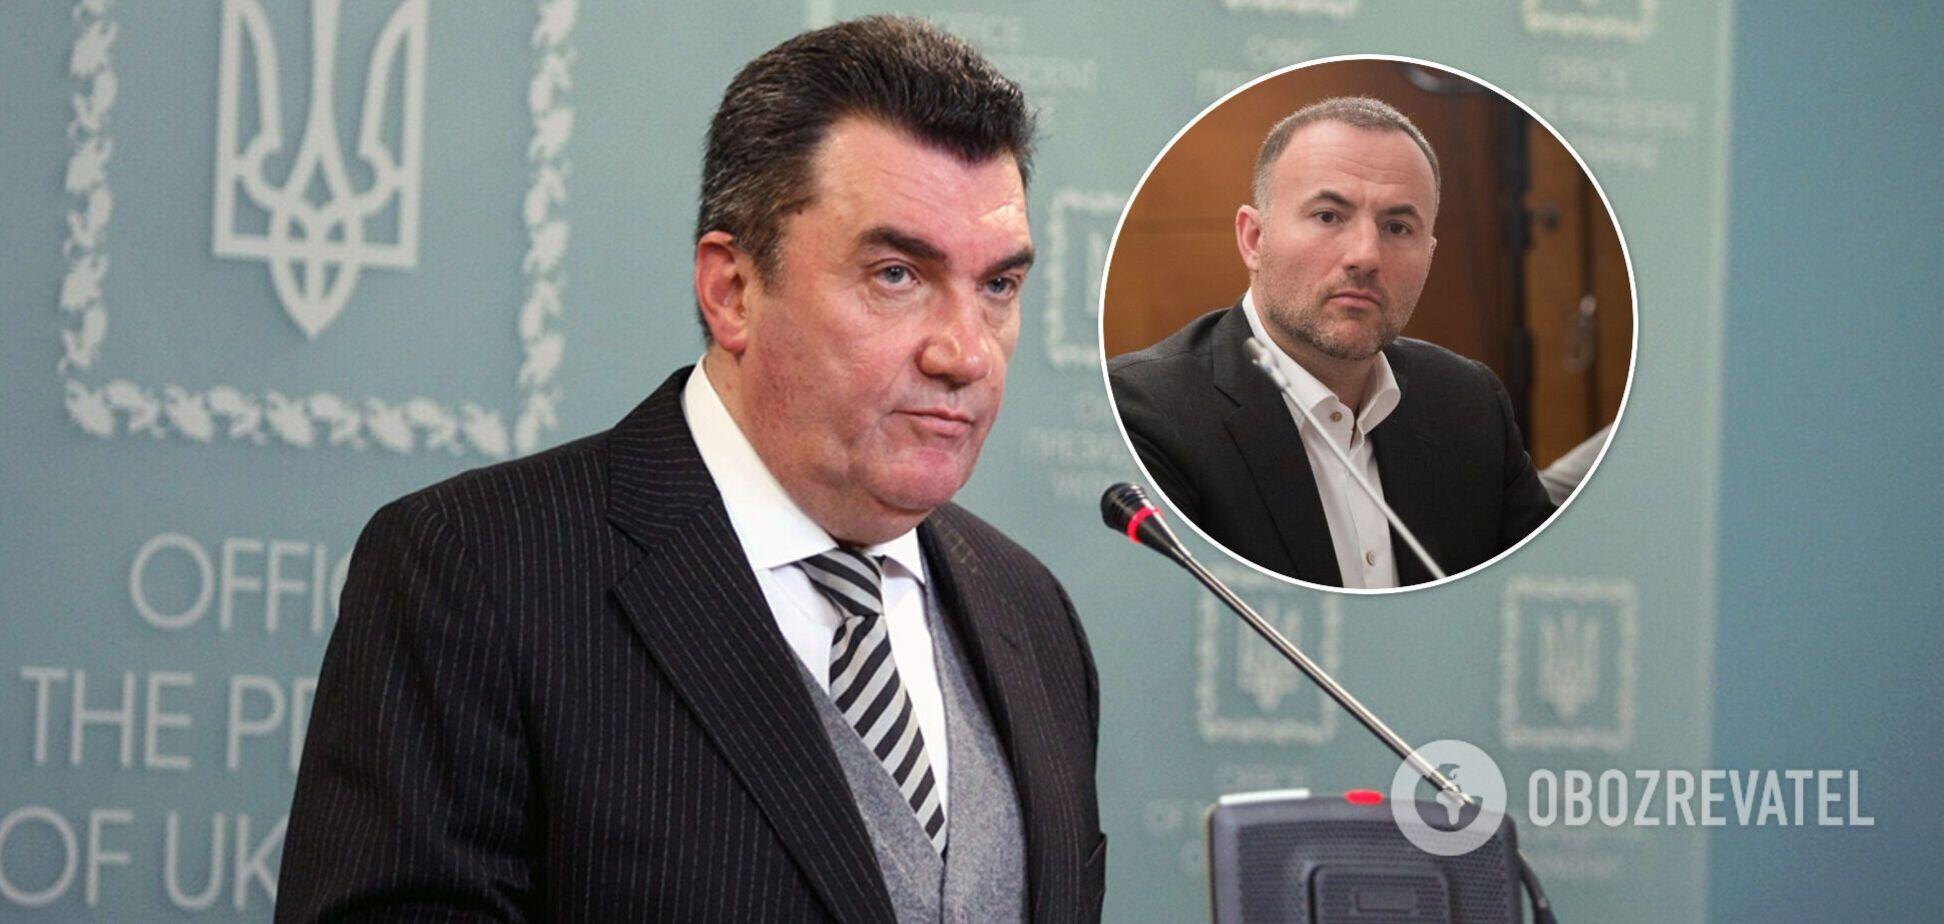 Данилов рассказал о санкциях против Фукса